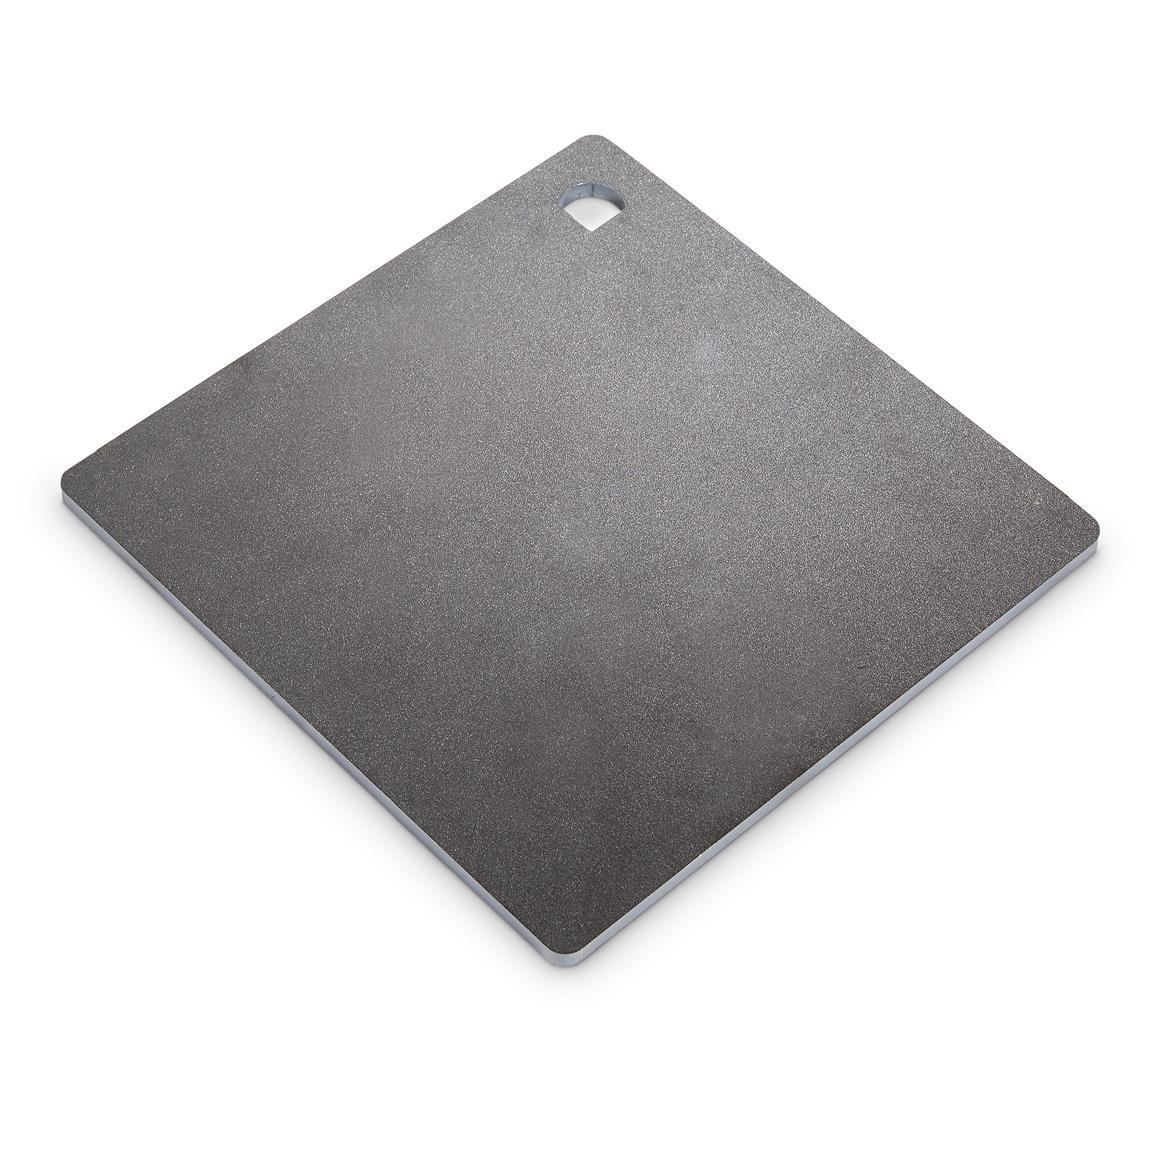 1155x1155 Ar500 Hardened Steel Plate Shooting Target, 10 X 10, 14